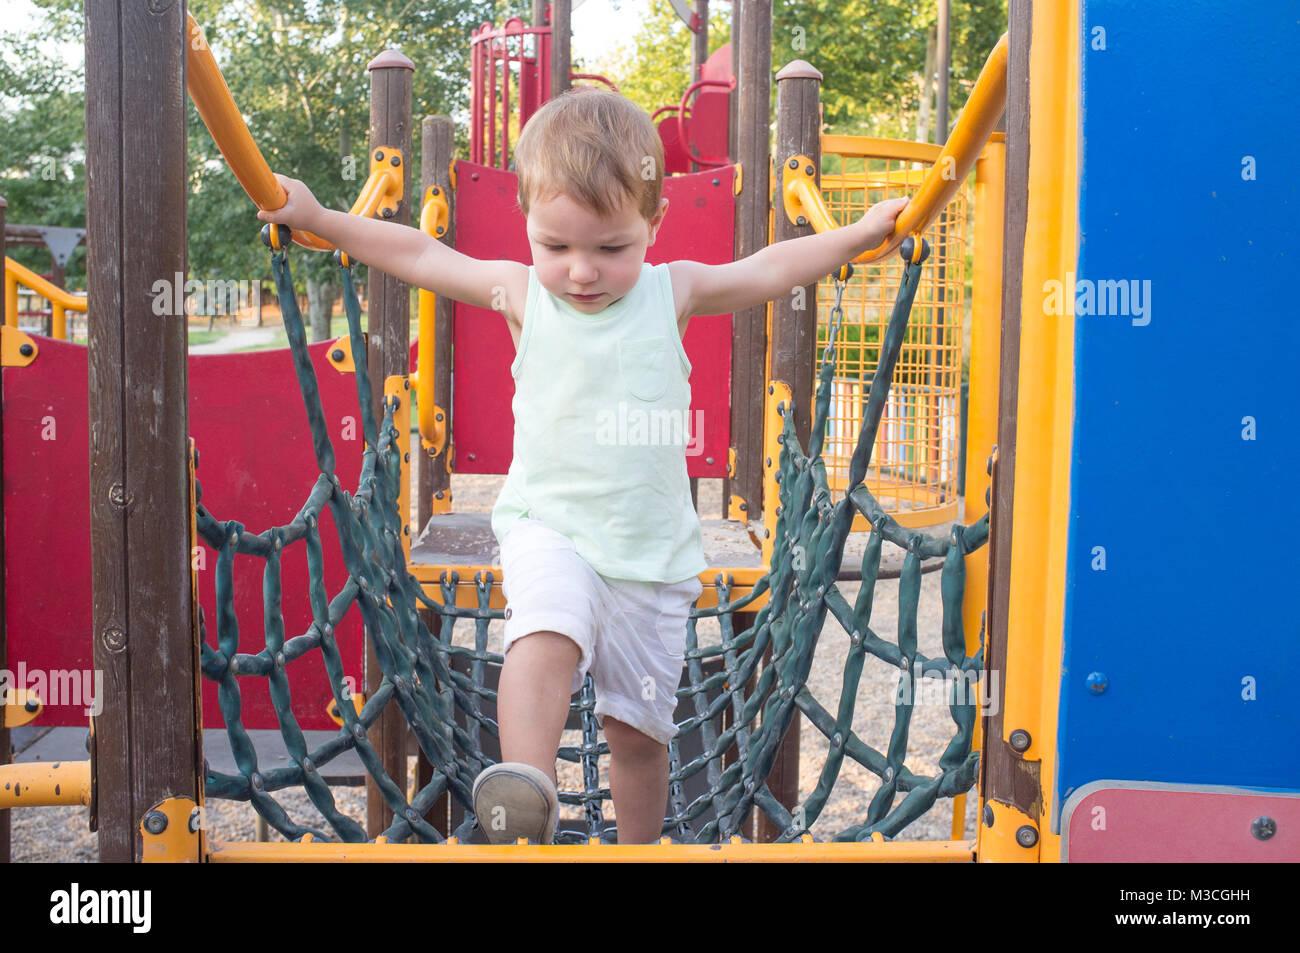 Toddler boy walking on blue net bridge. Equipment on a playground - Stock Image